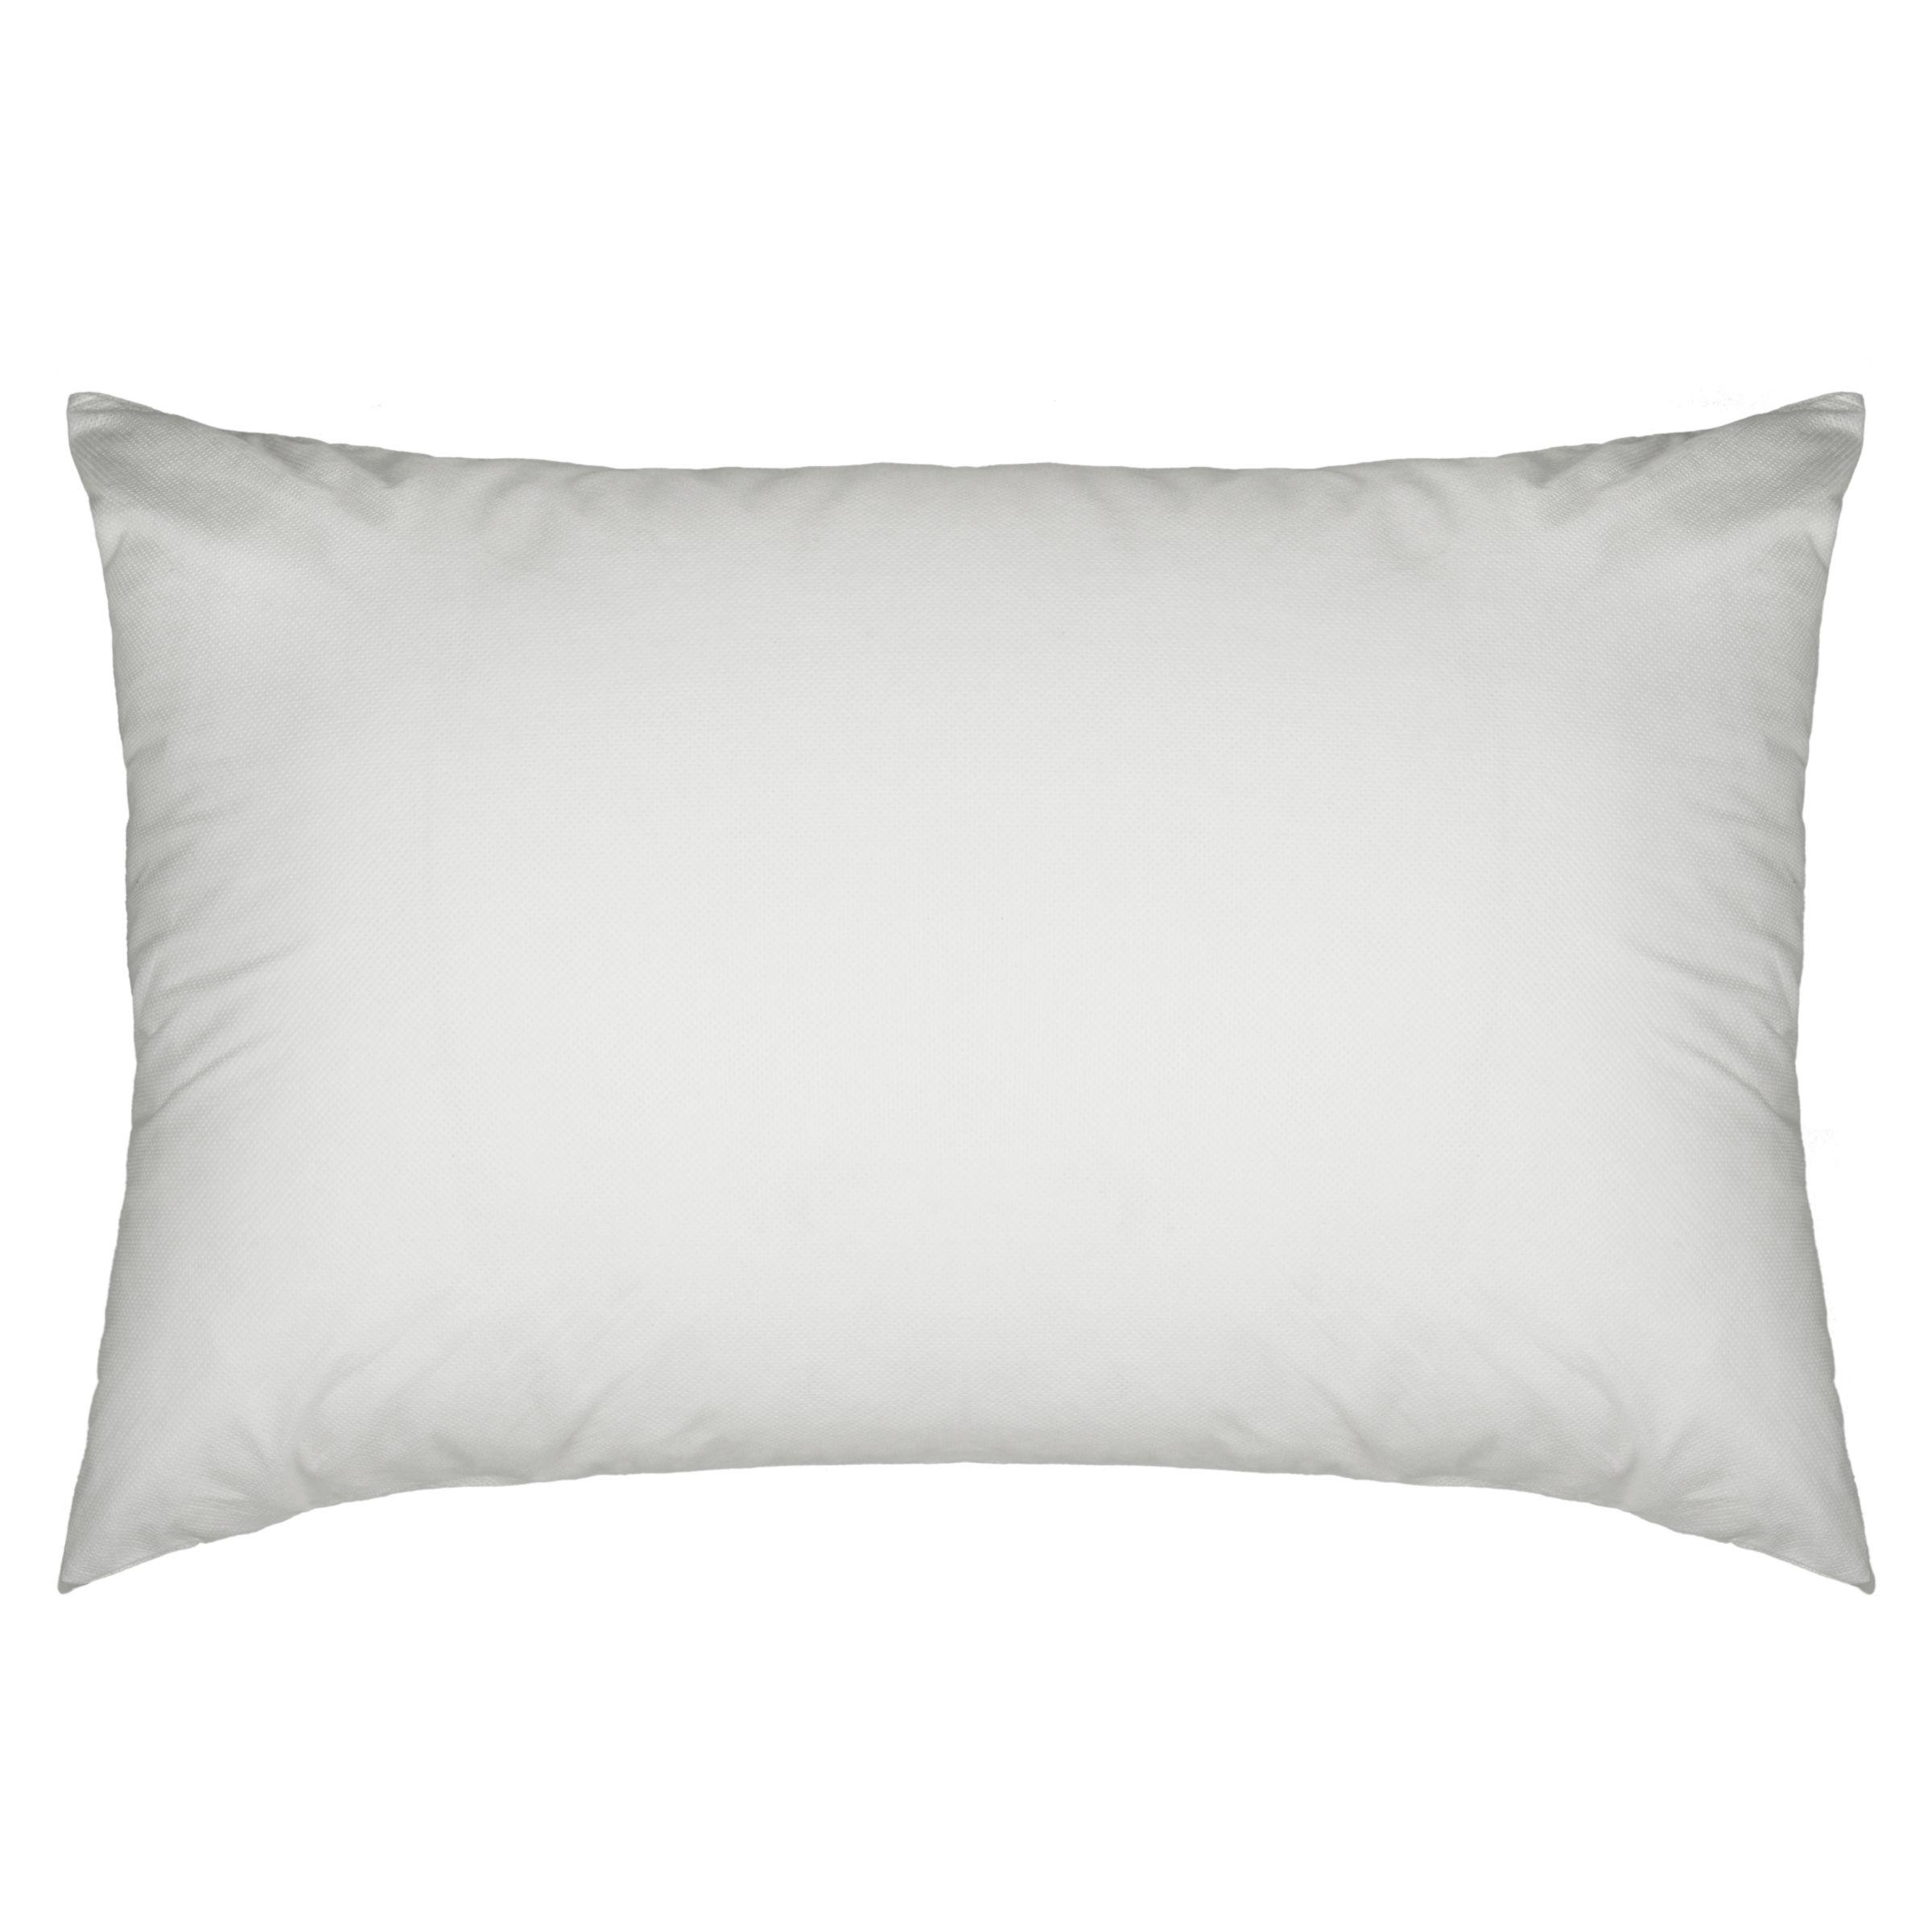 Silentnight Anti Allergy Pair Of Pillow Protectors